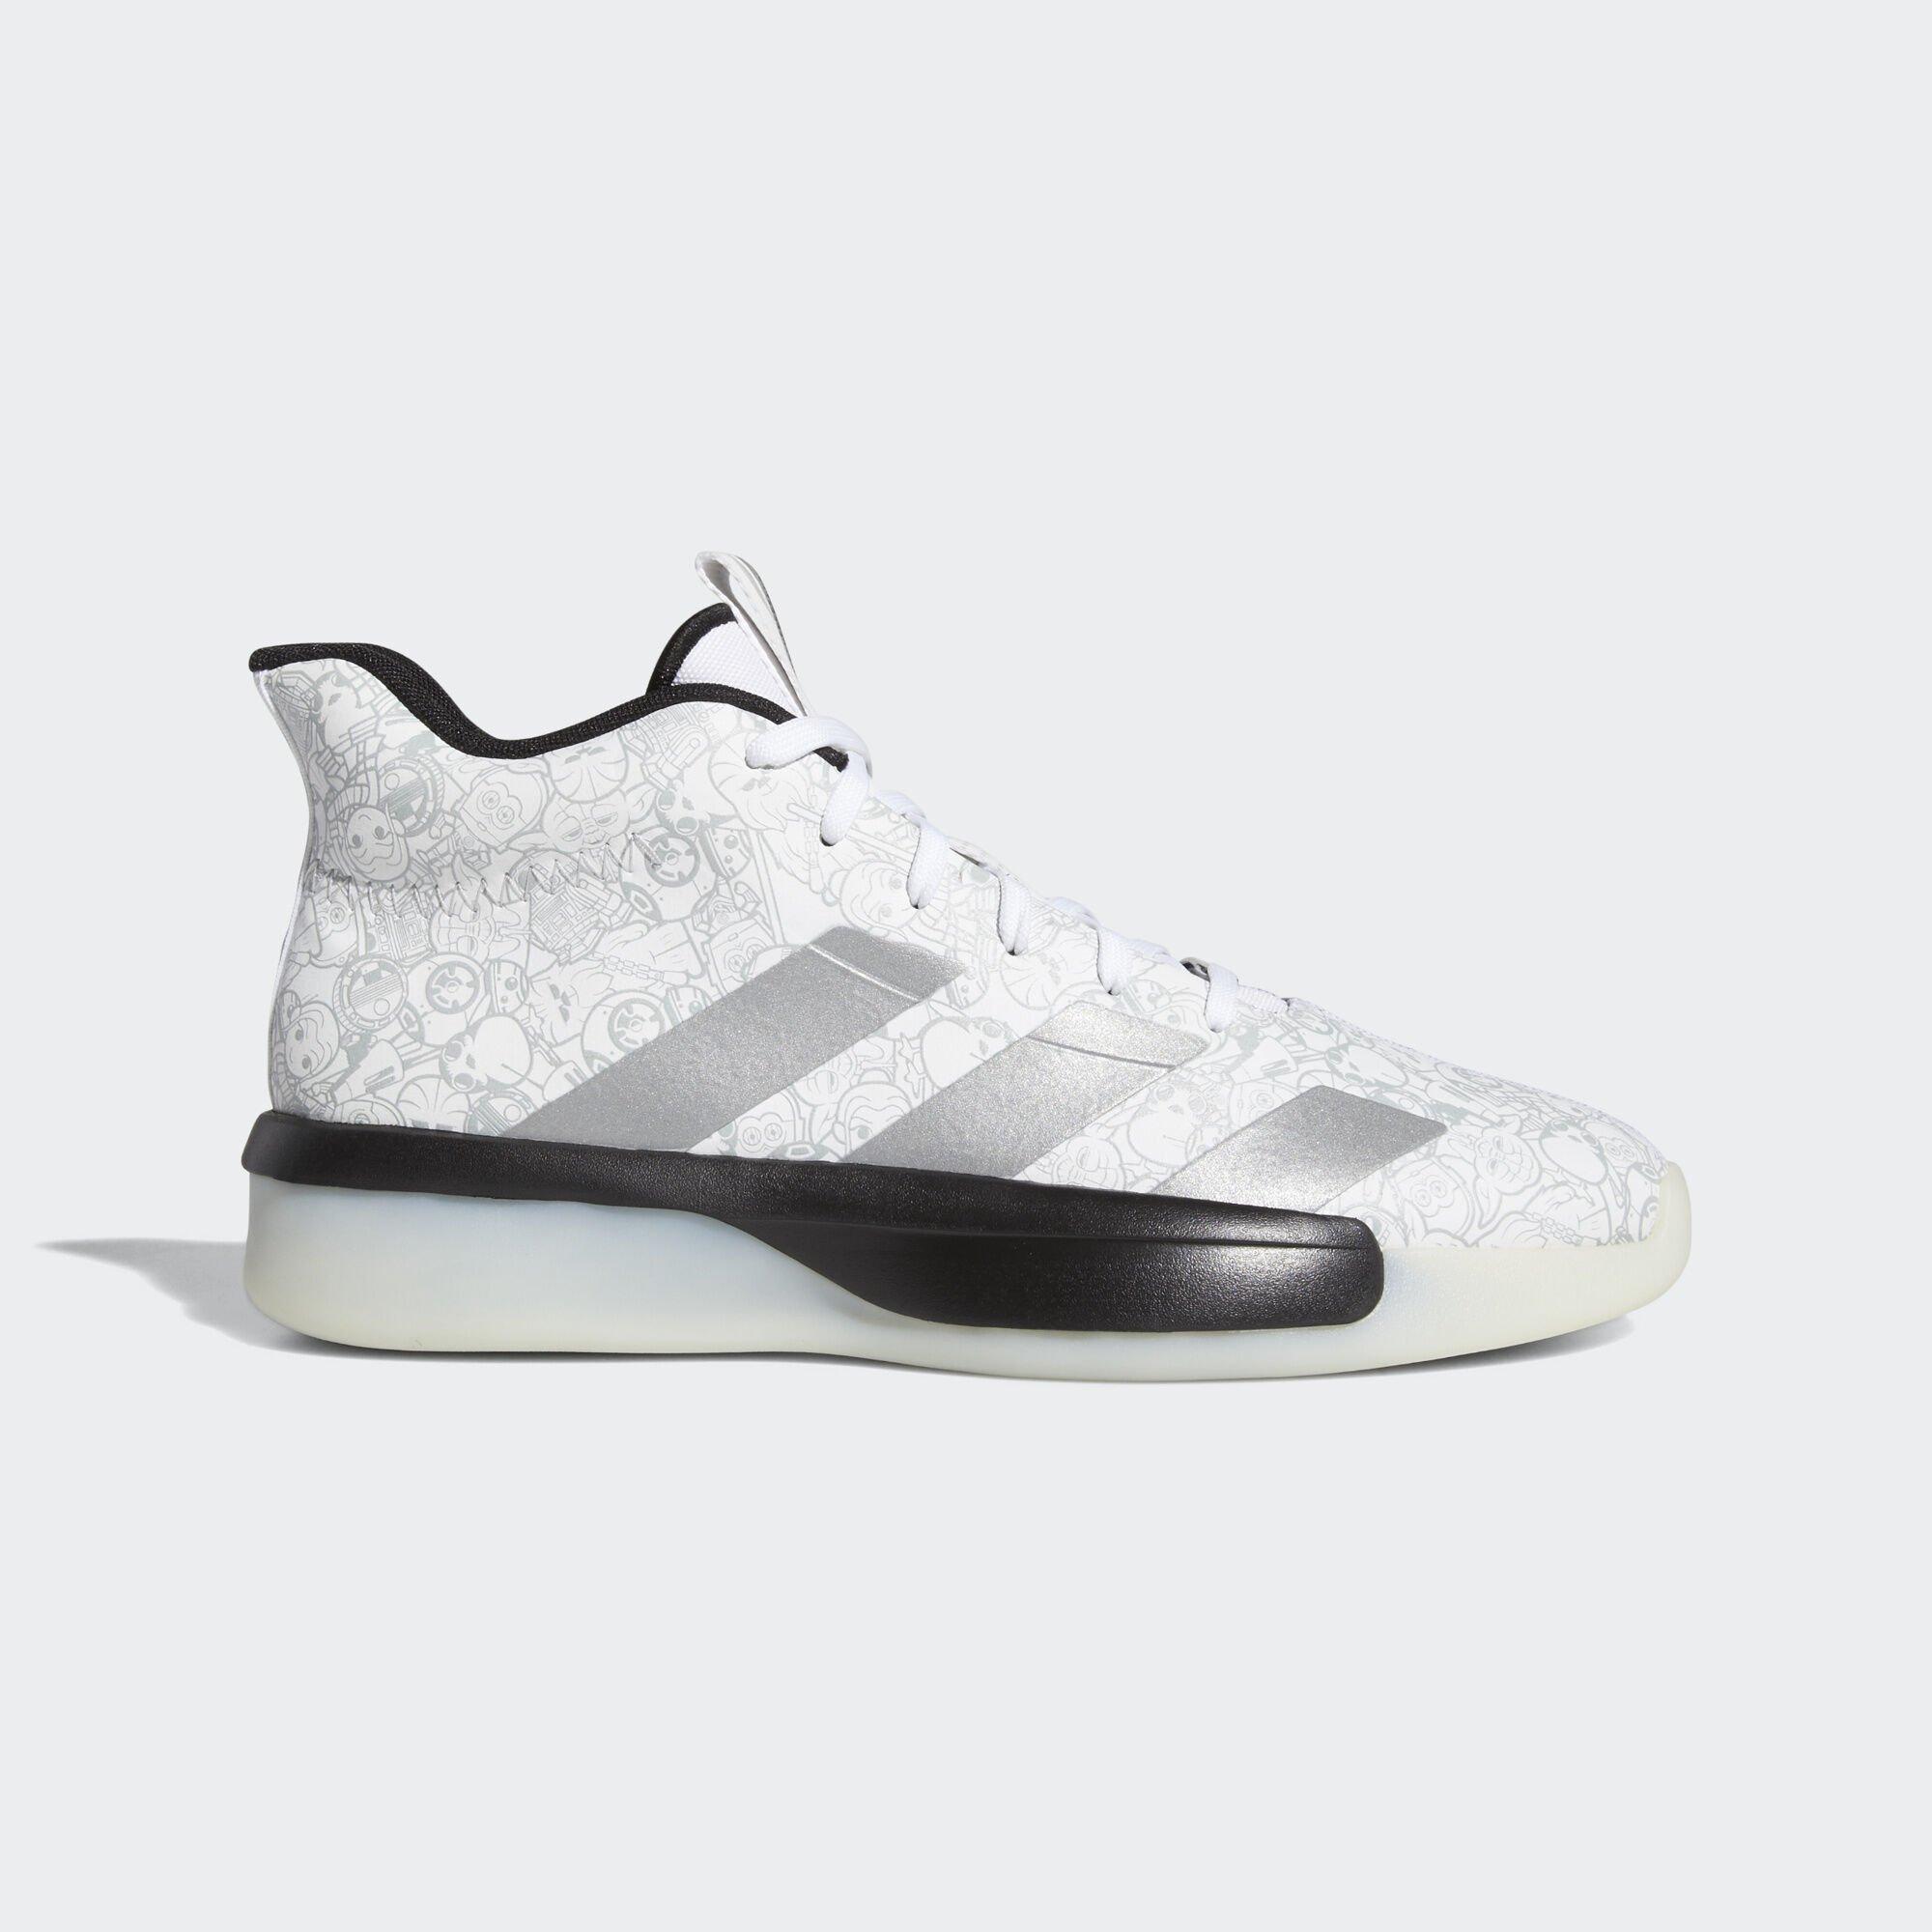 adidas,星球大战,发售 阴阳设计 + 可爱涂鸦!这双星战 x adidas 联名球鞋有点酷